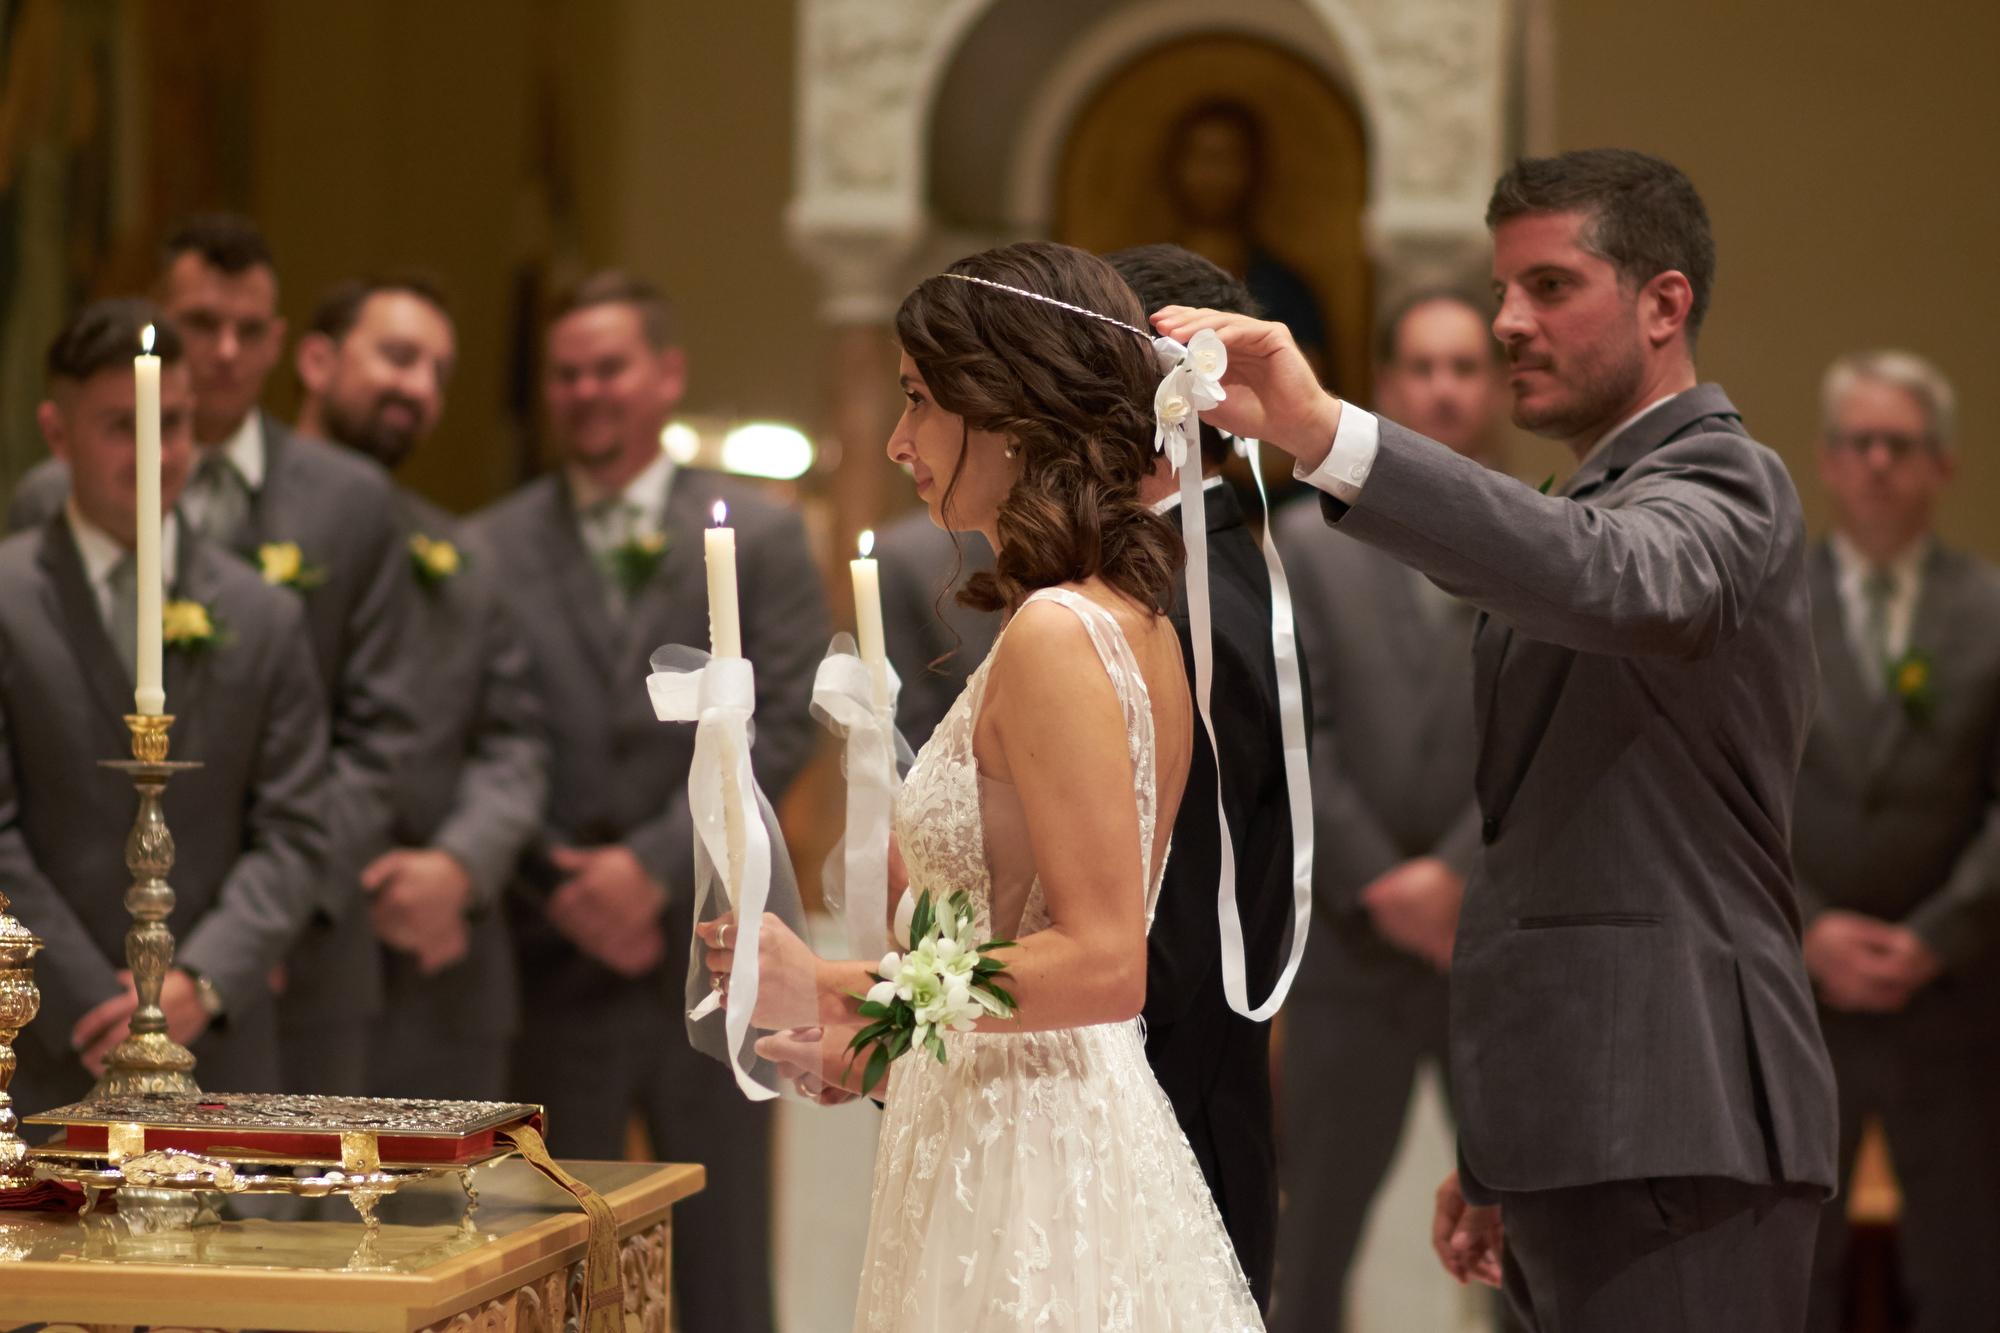 2019-07-20_16-03-22_FUJIFILM_X-T1_(c)_RH_weddingsbyryanandkate.com.JPG